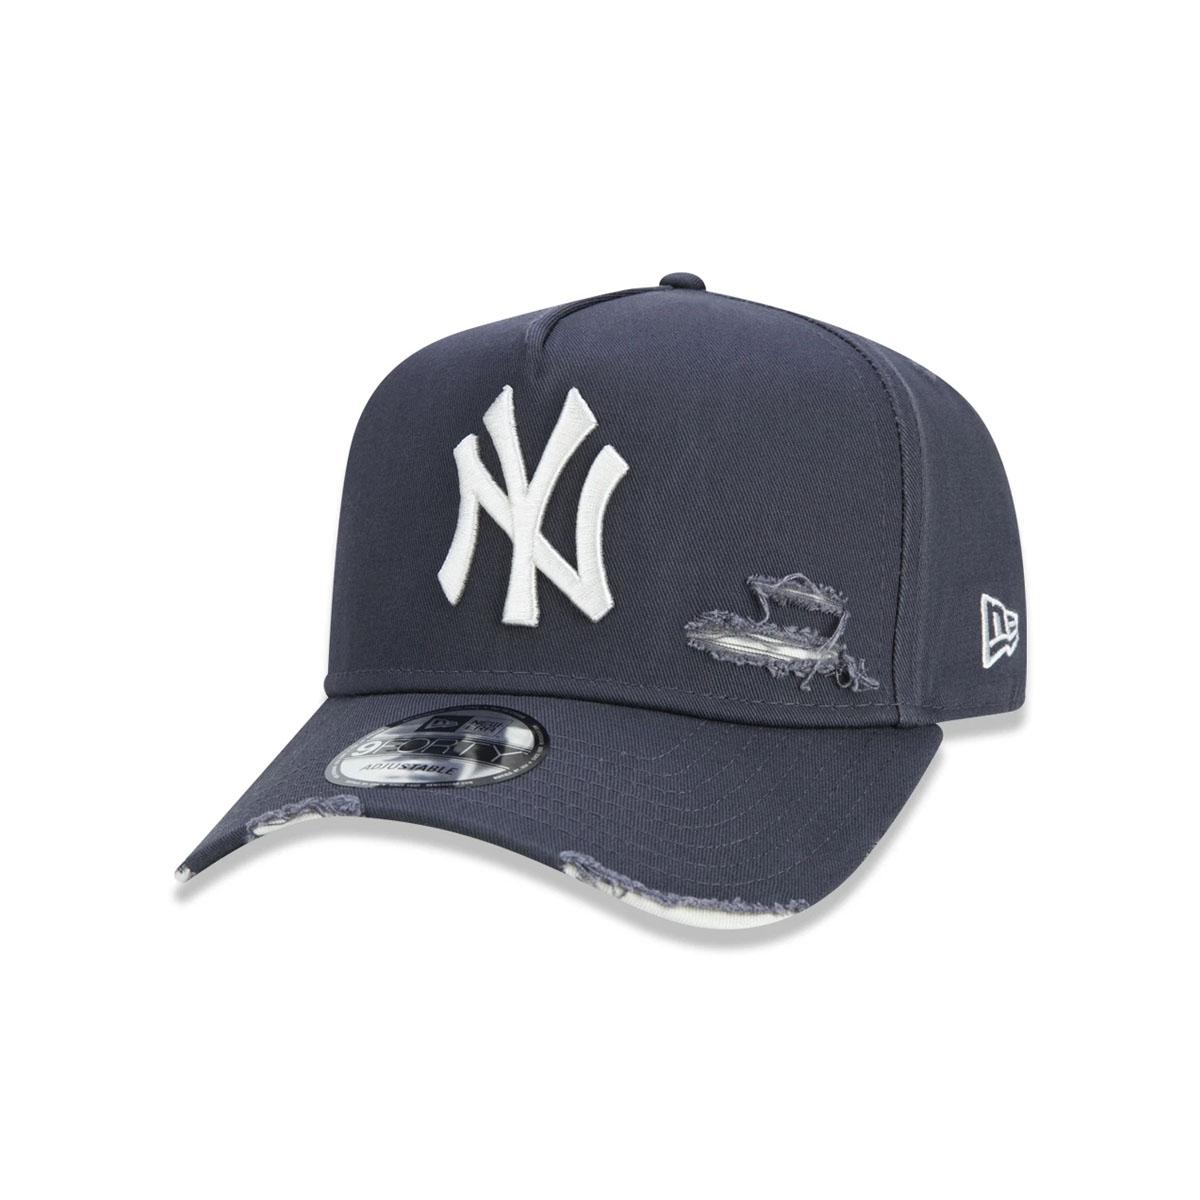 Boné New Era New York Yankees Destroyed Cinza